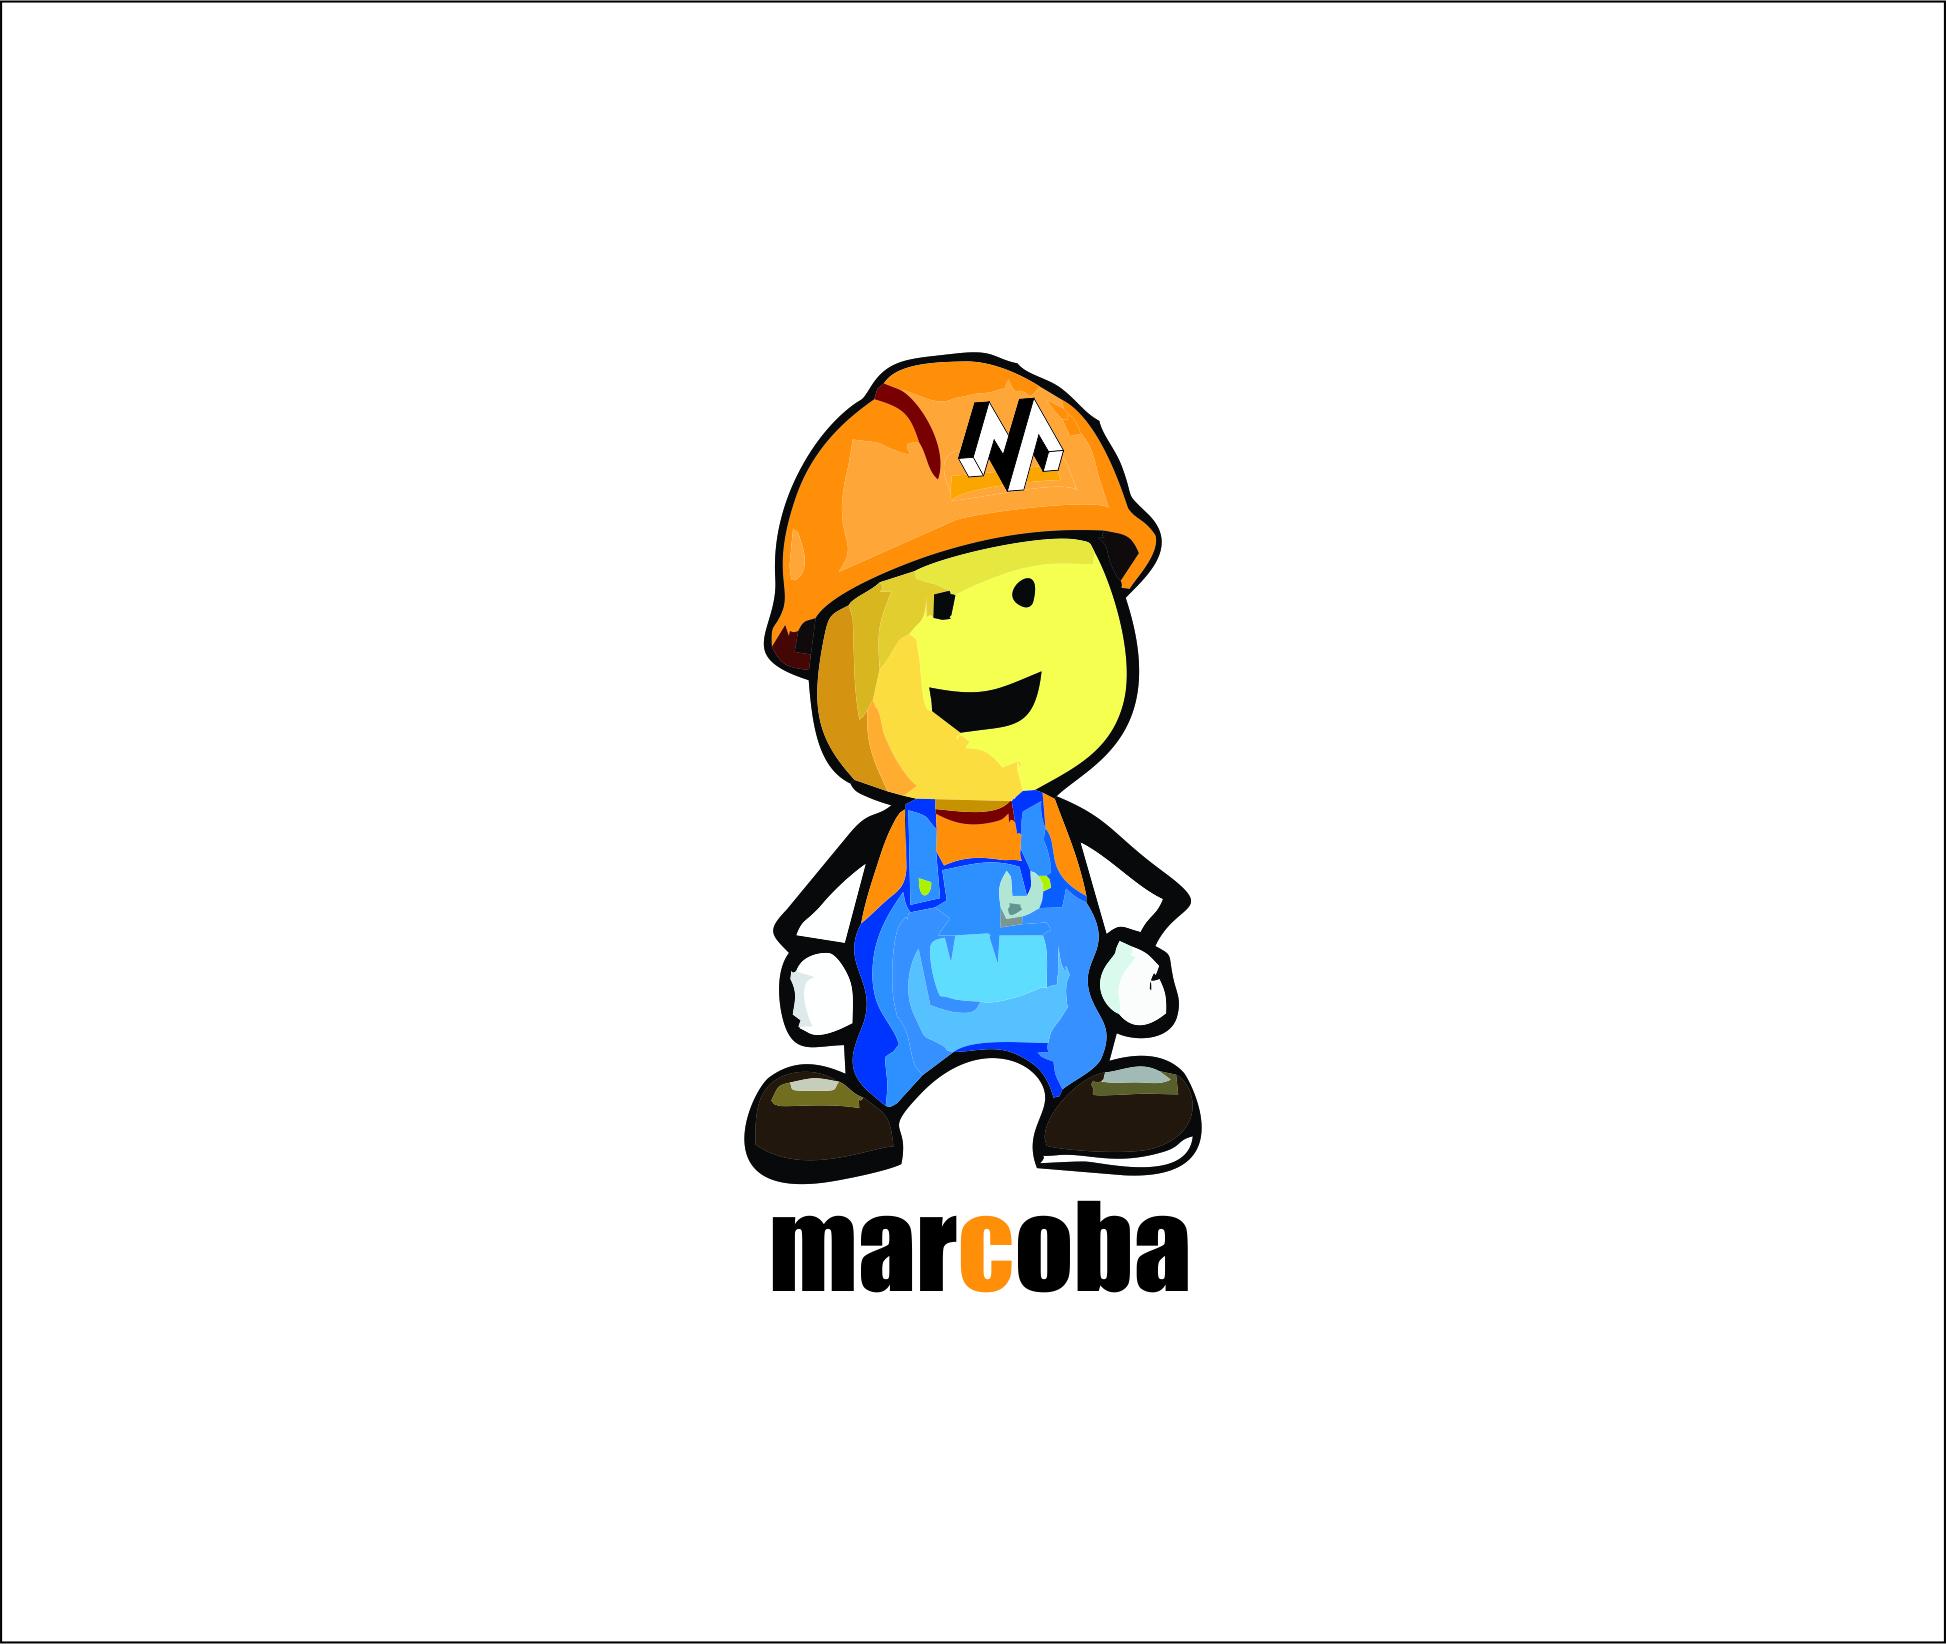 Marcoba